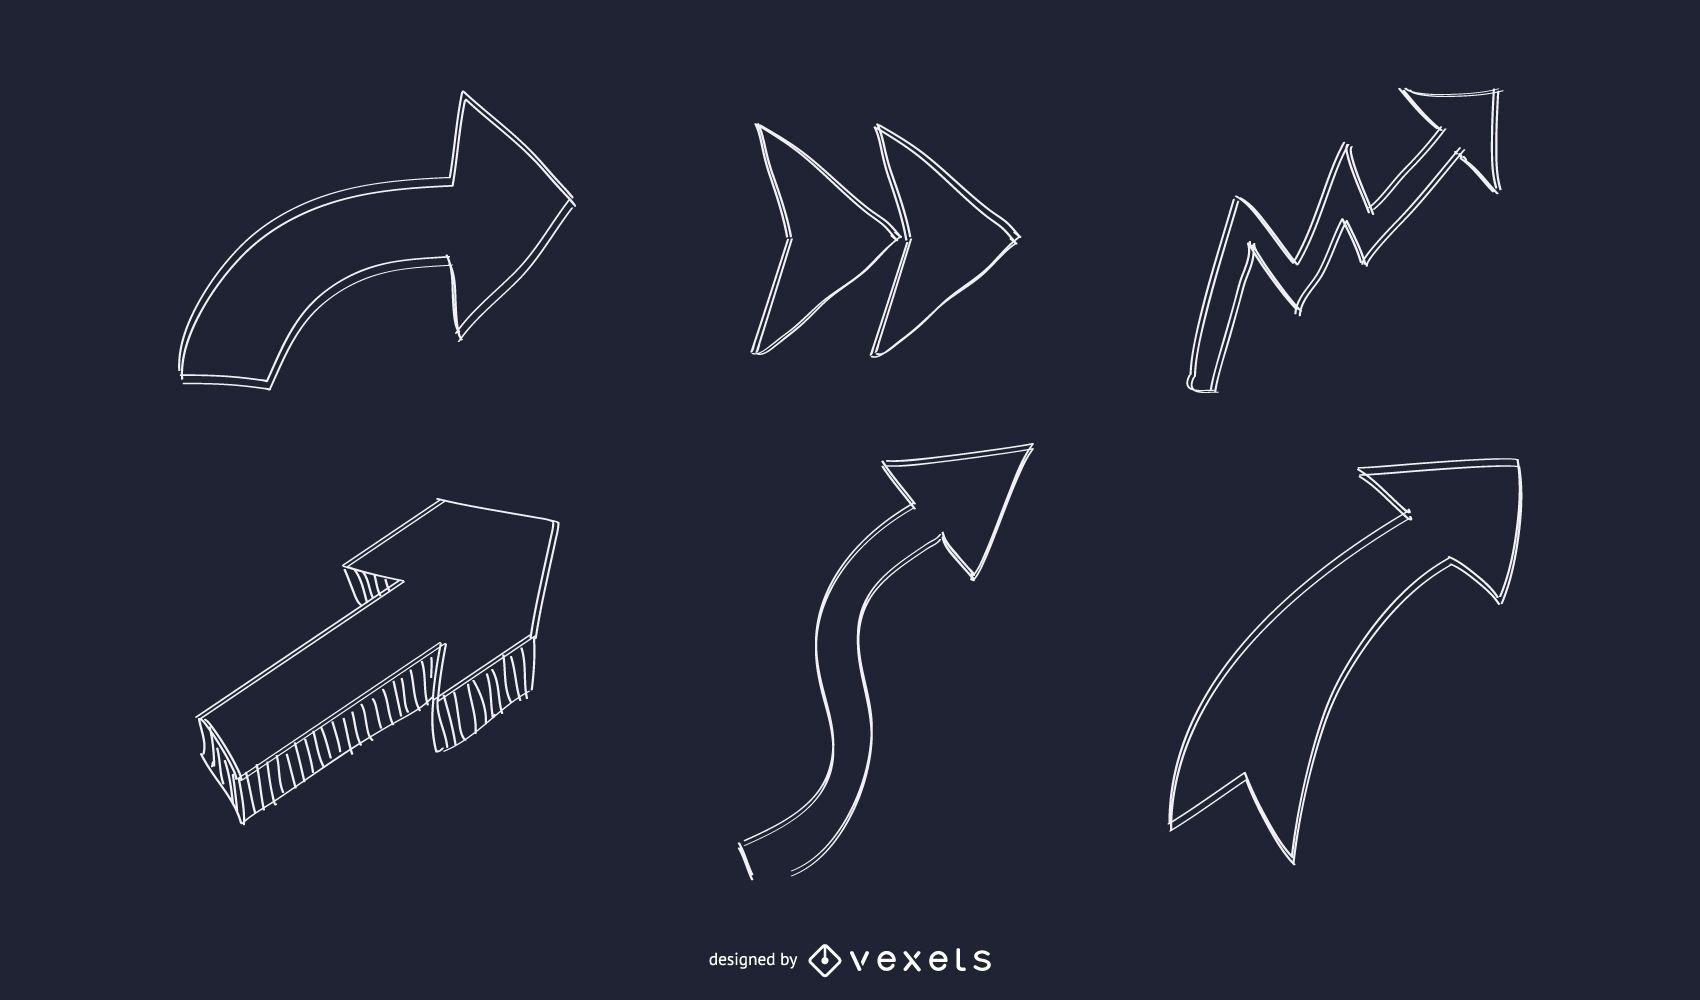 Abstract Hand Drawn Arrow Set